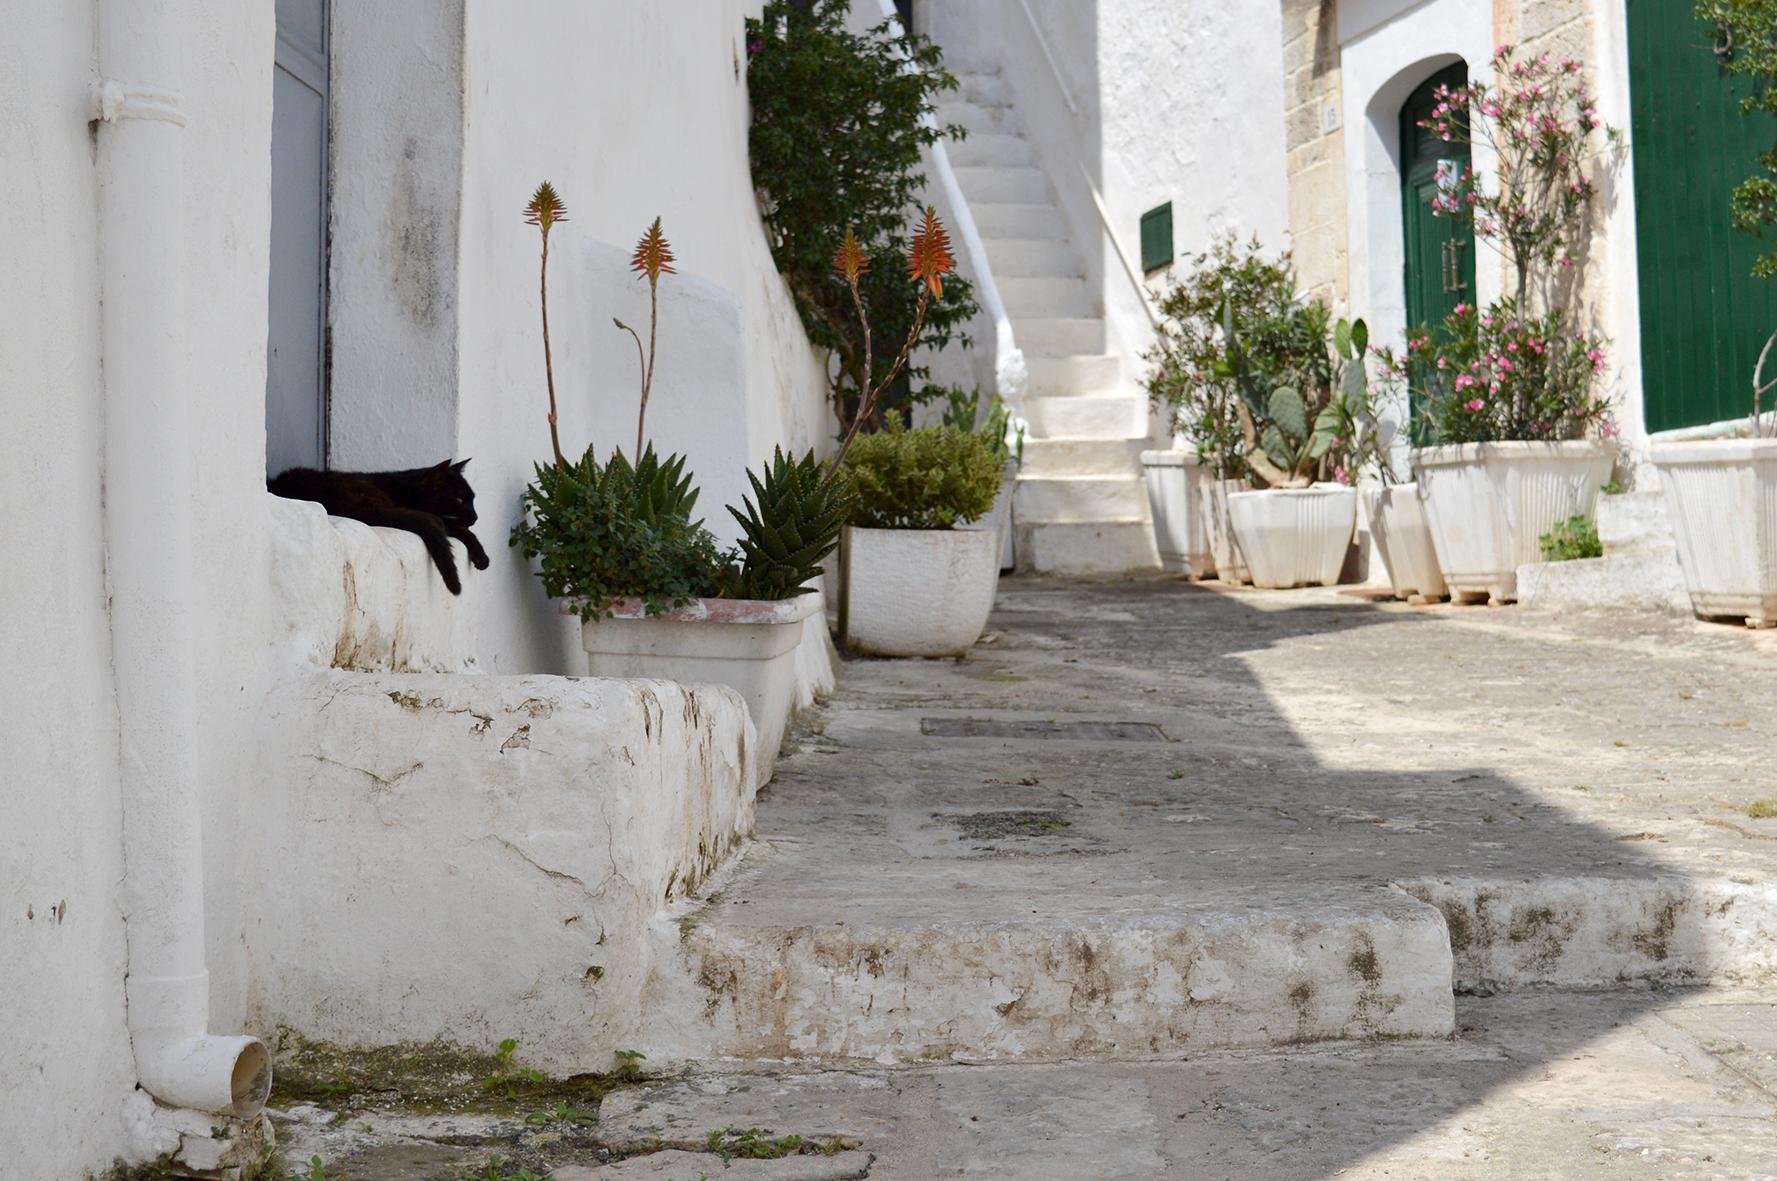 Black Cat, Old Town, Ostuni